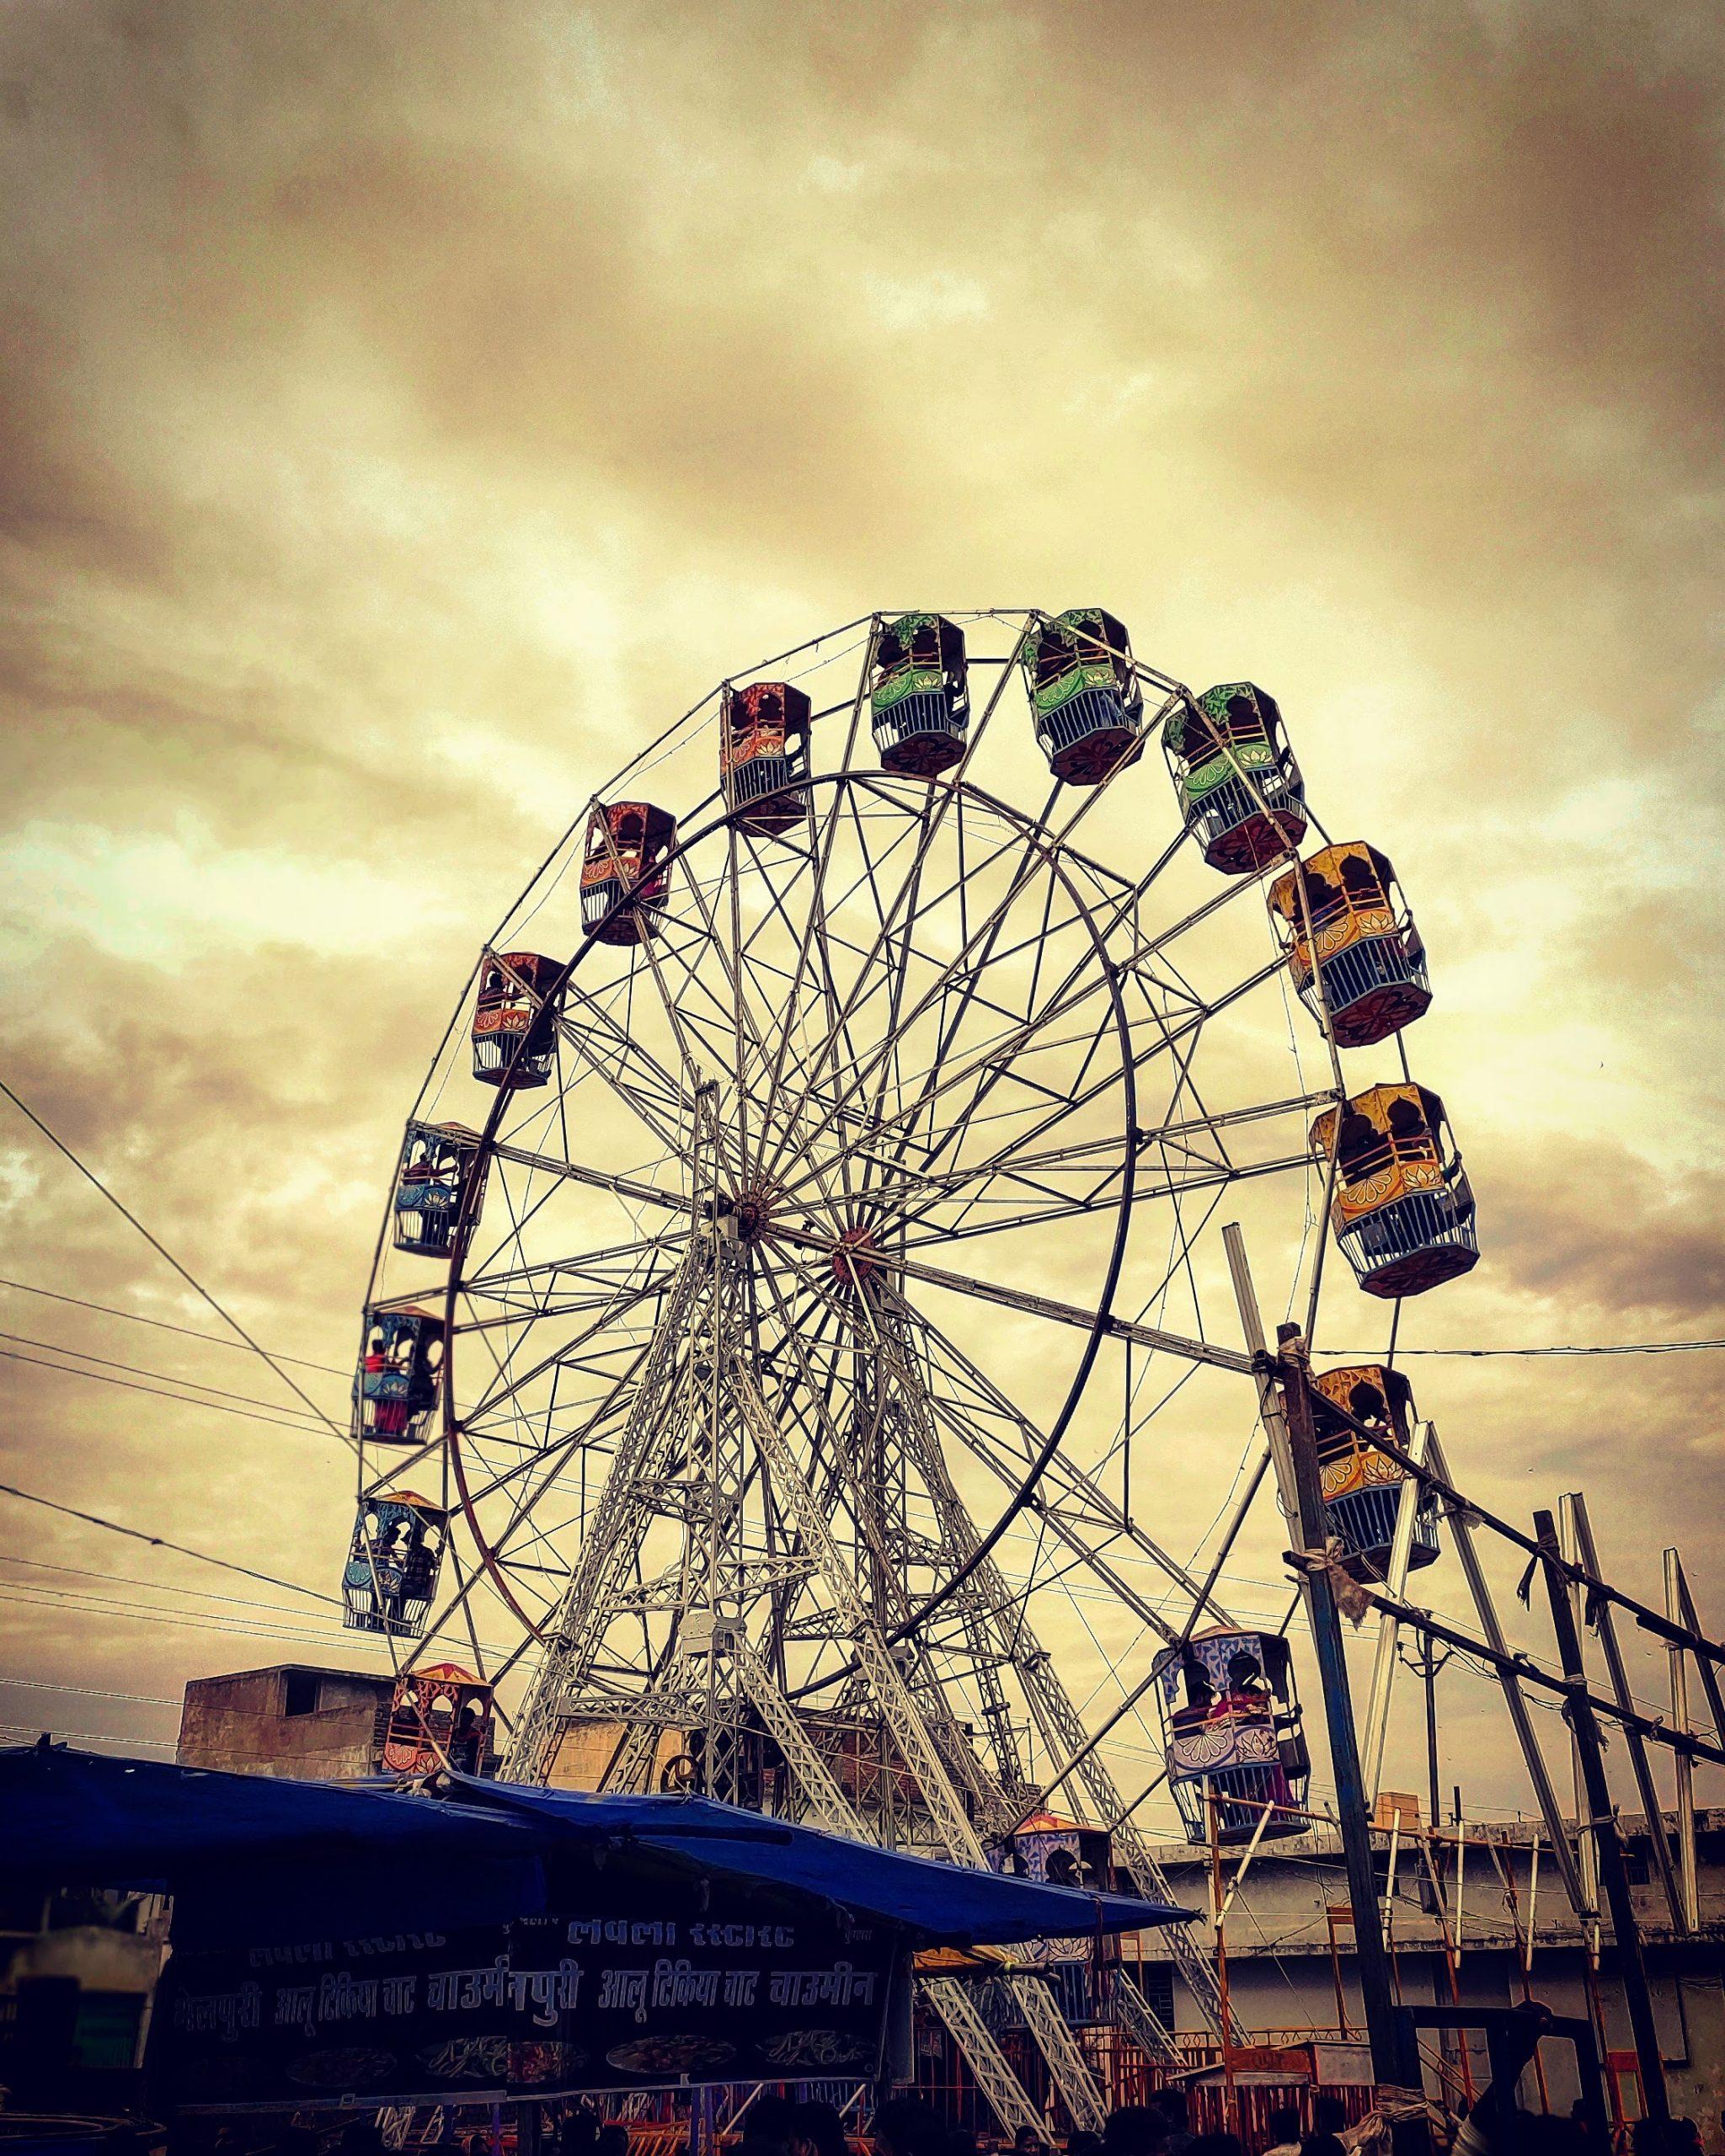 A ferris wheel in amusement park